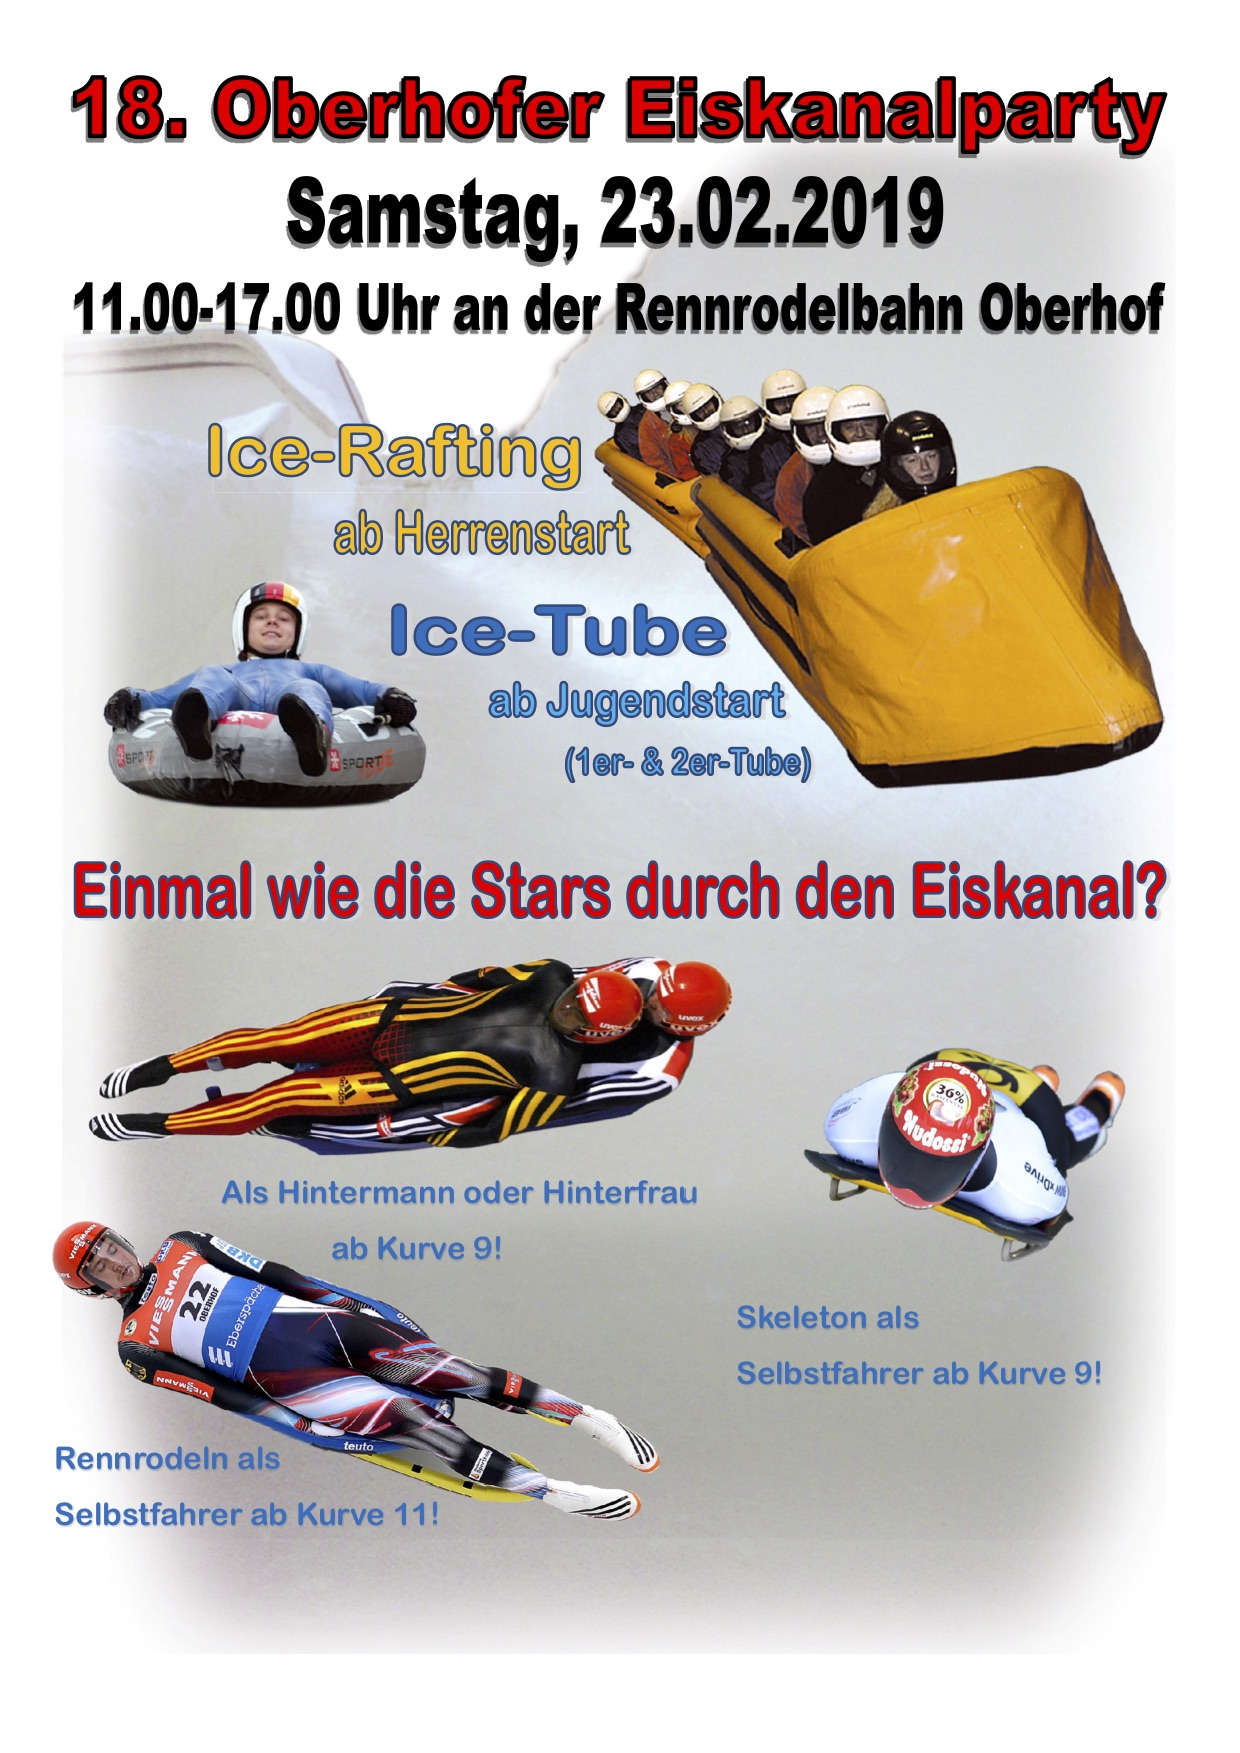 18. Oberhofer Eiskanalparty